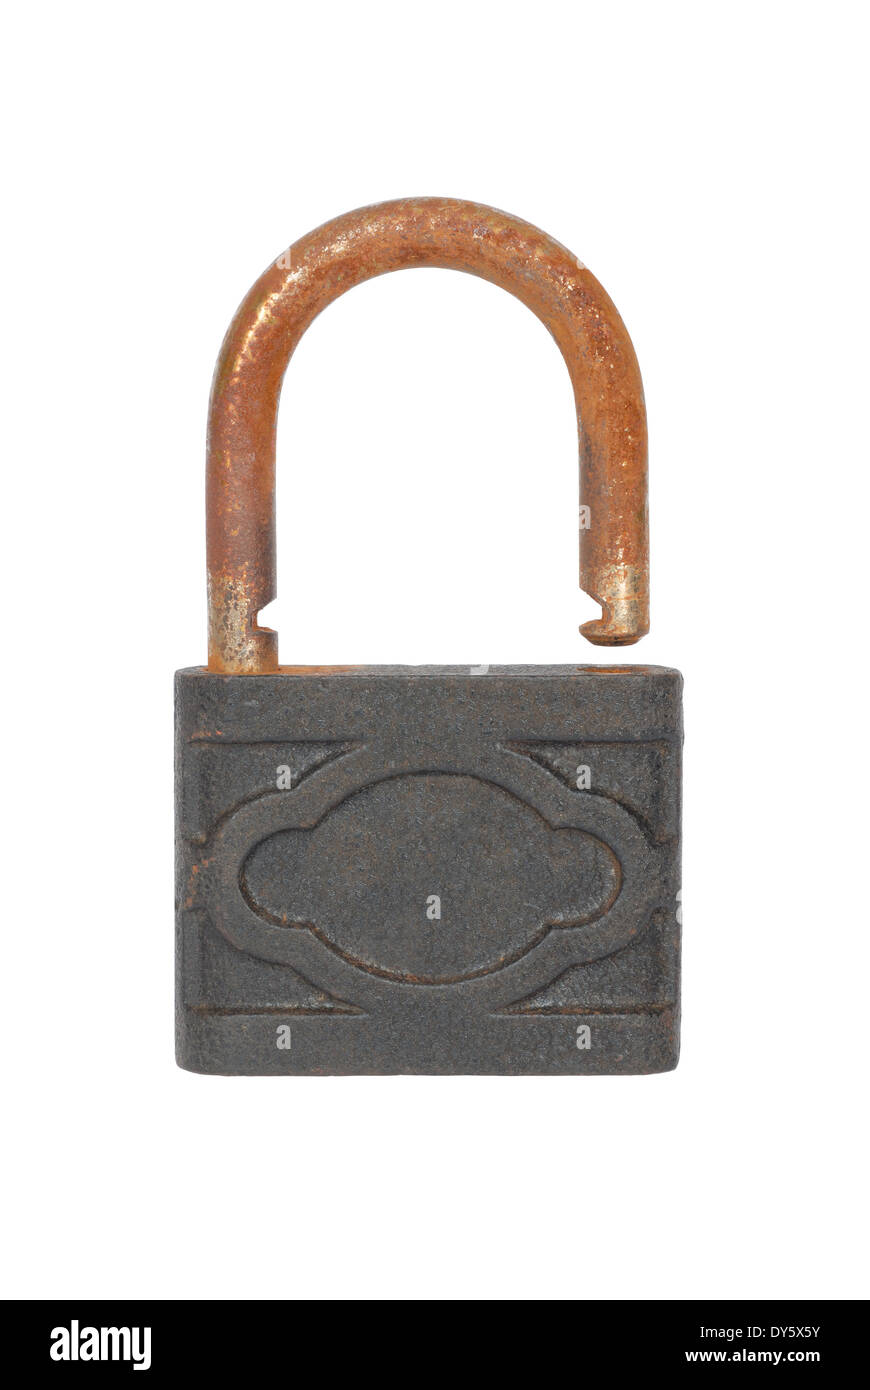 Rusty padlock - Stock Image